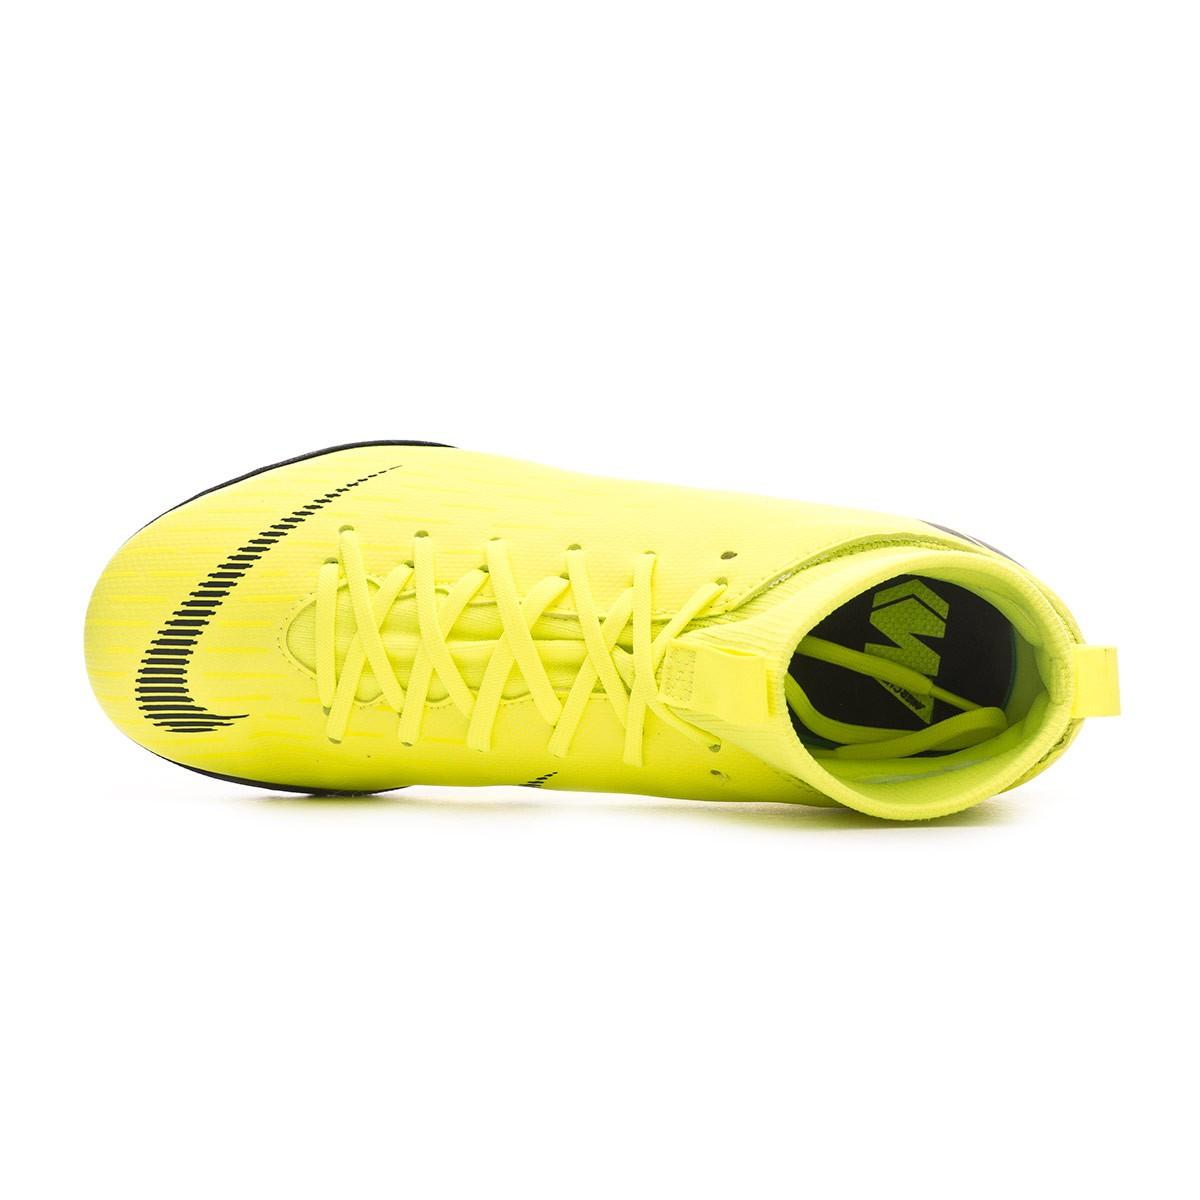 60fee915245 Football Boot Nike Kids Mercurial SuperflyX VI Academy Turf Volt-Black - Tienda  de fútbol Fútbol Emotion